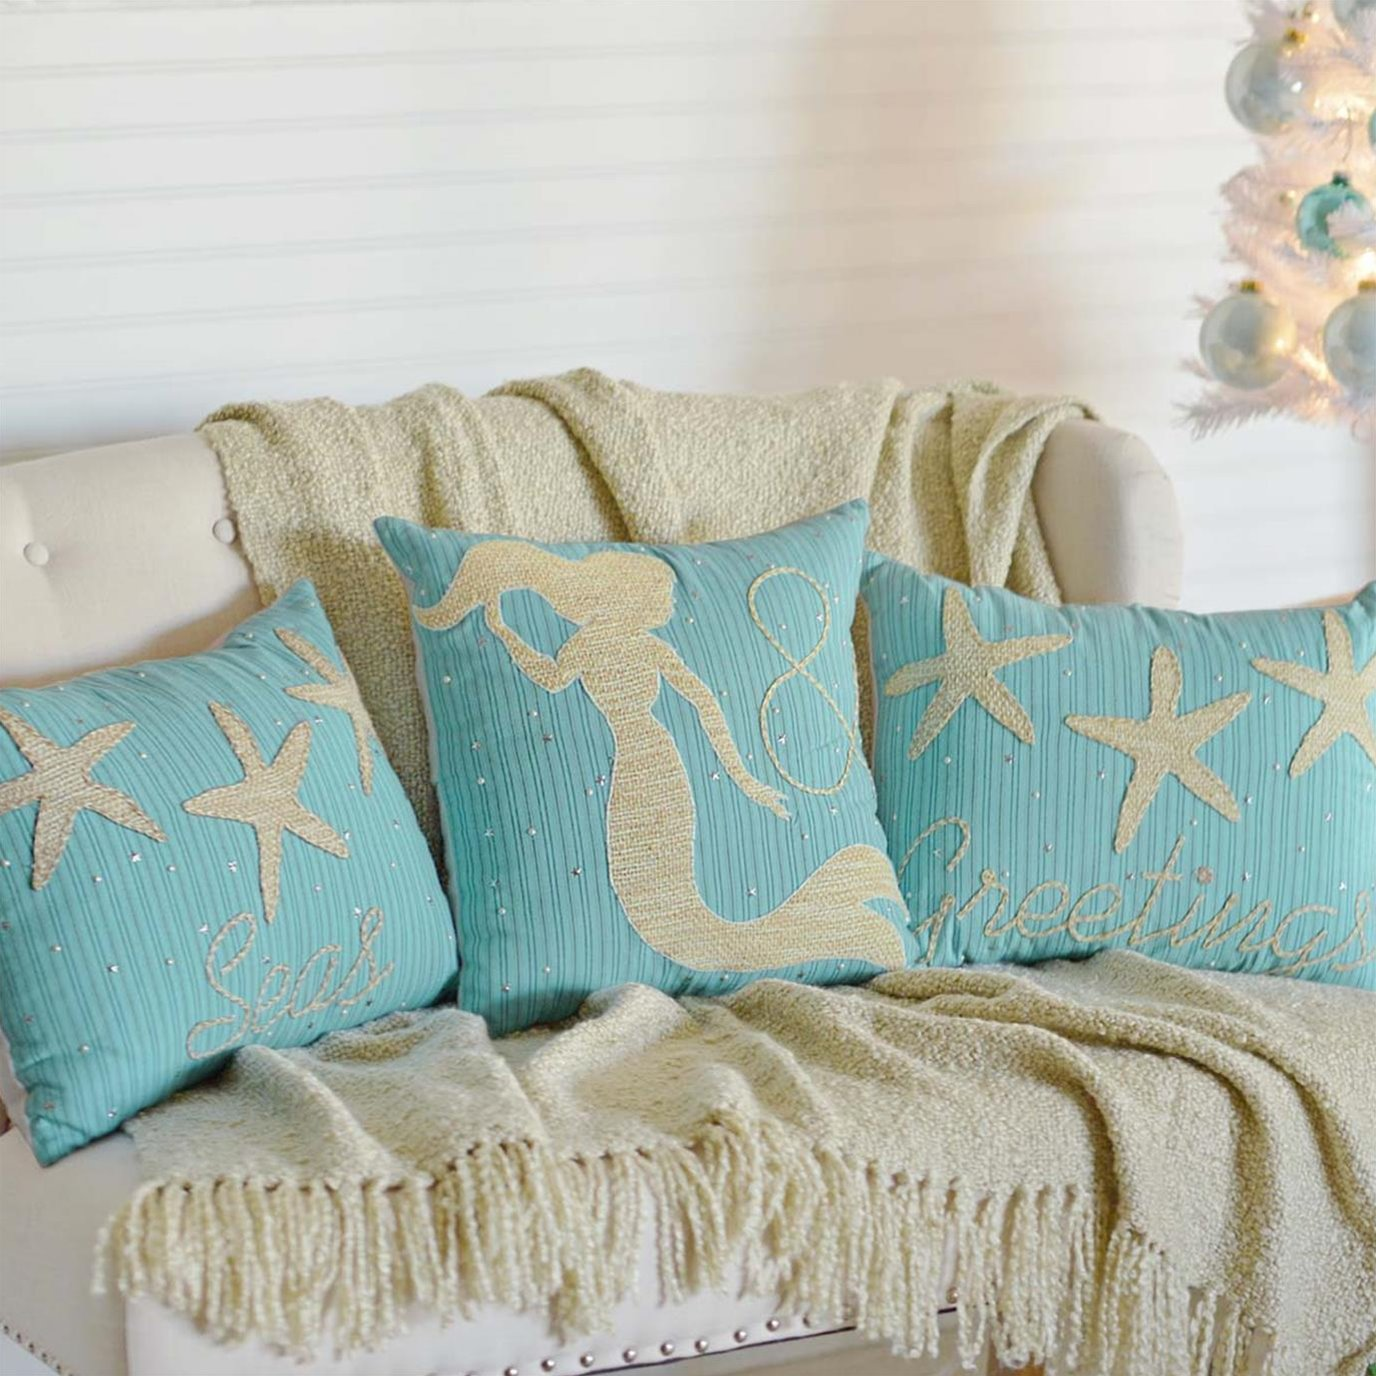 Nerine Seas & Greetings Set of 3 Pillows-Asstd Sizes